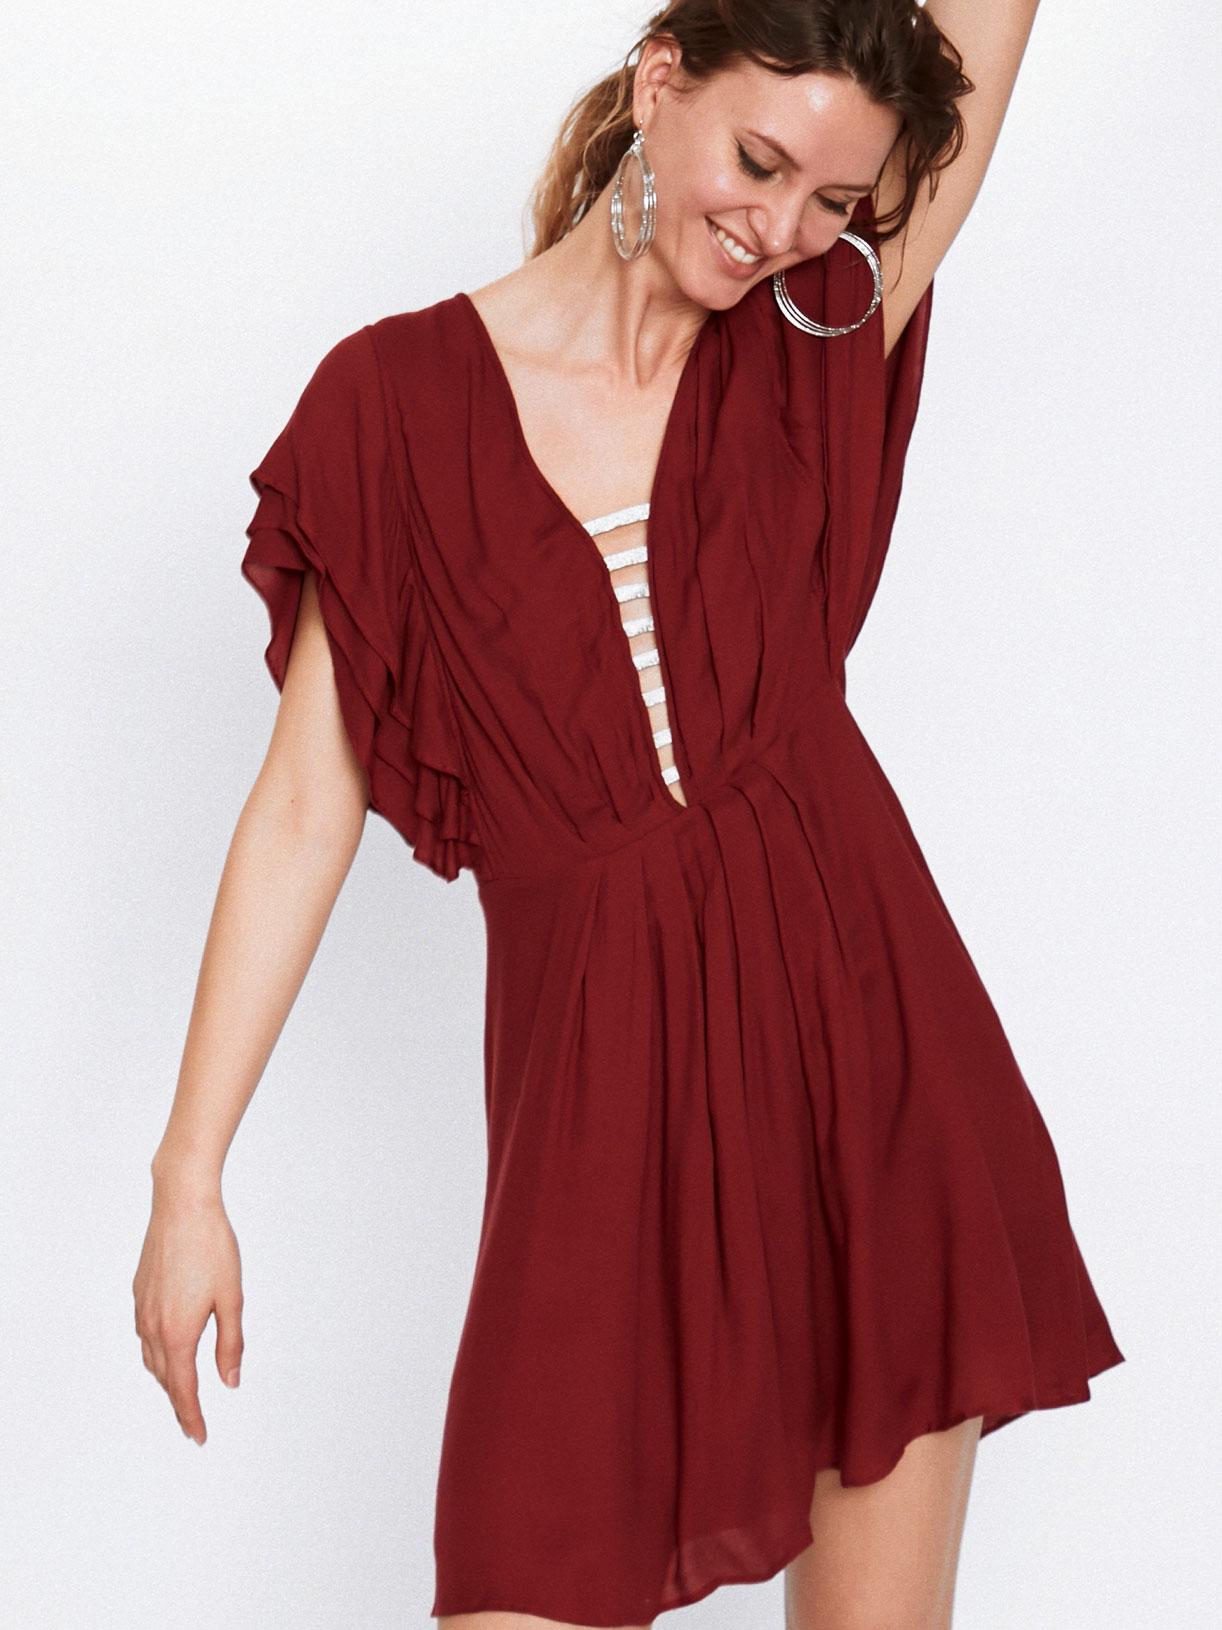 Marcees - Robe courte